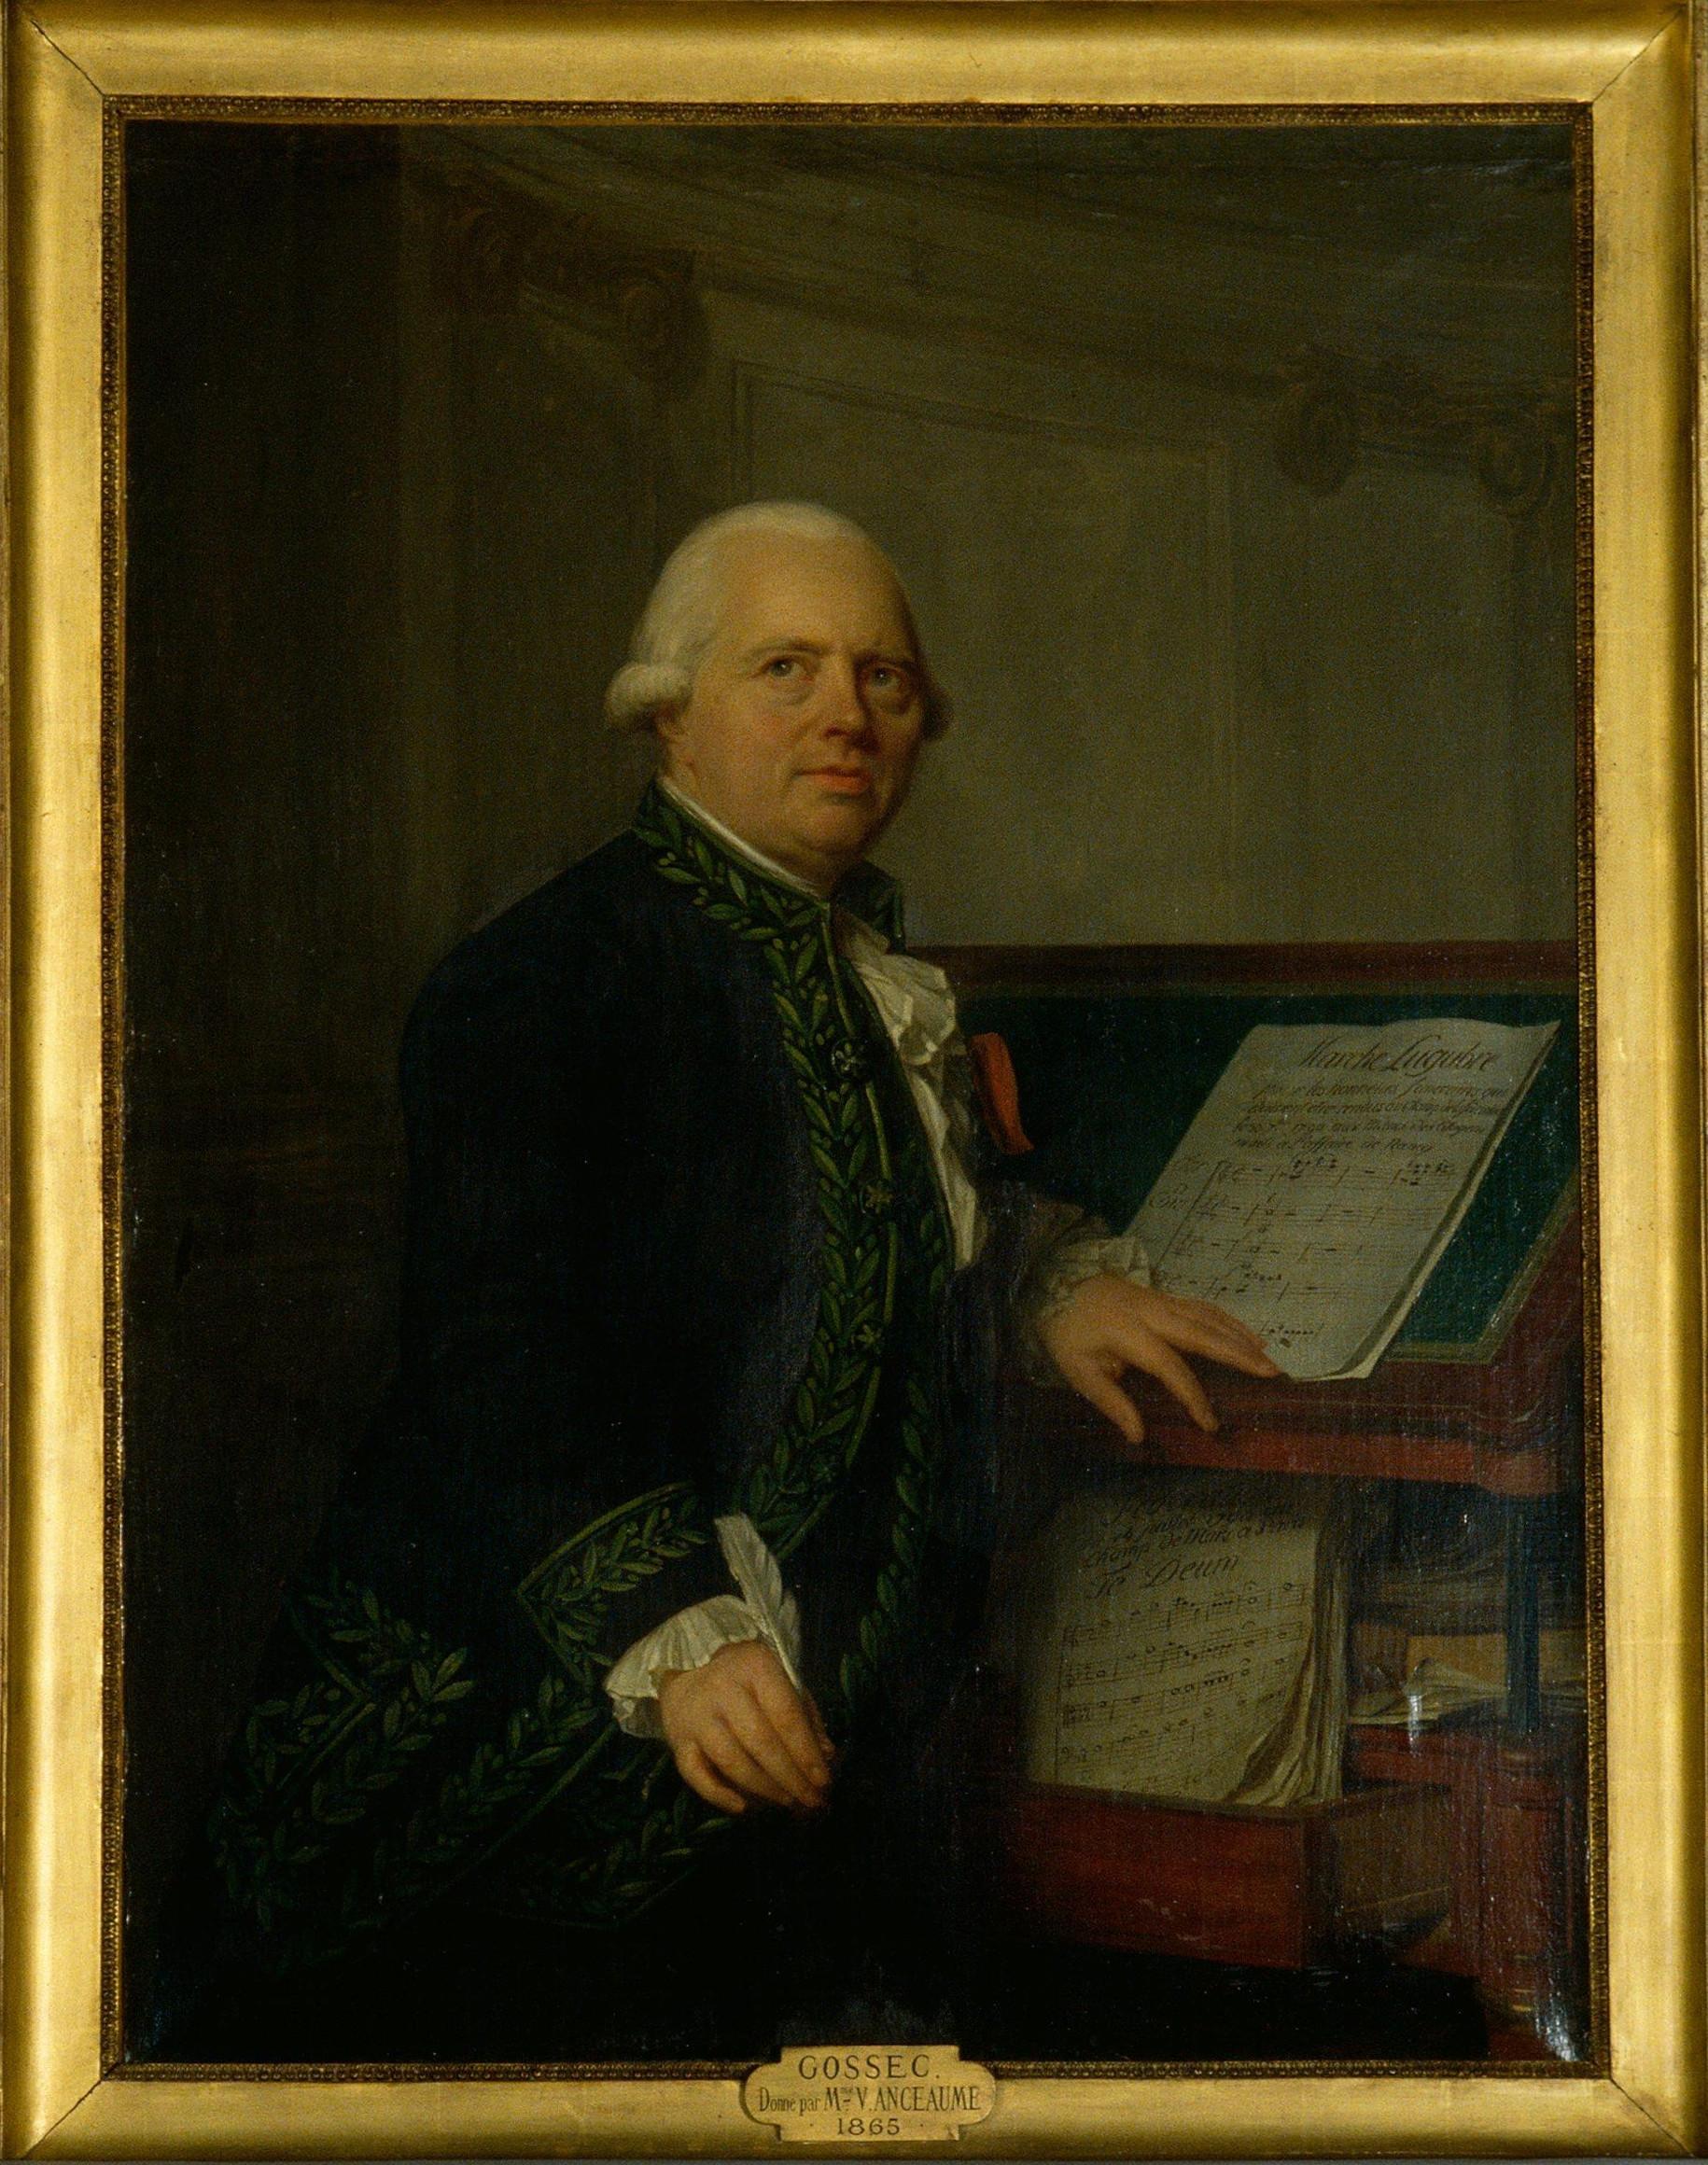 François-Joseph Gossec, by [[Antoine Vestier]]